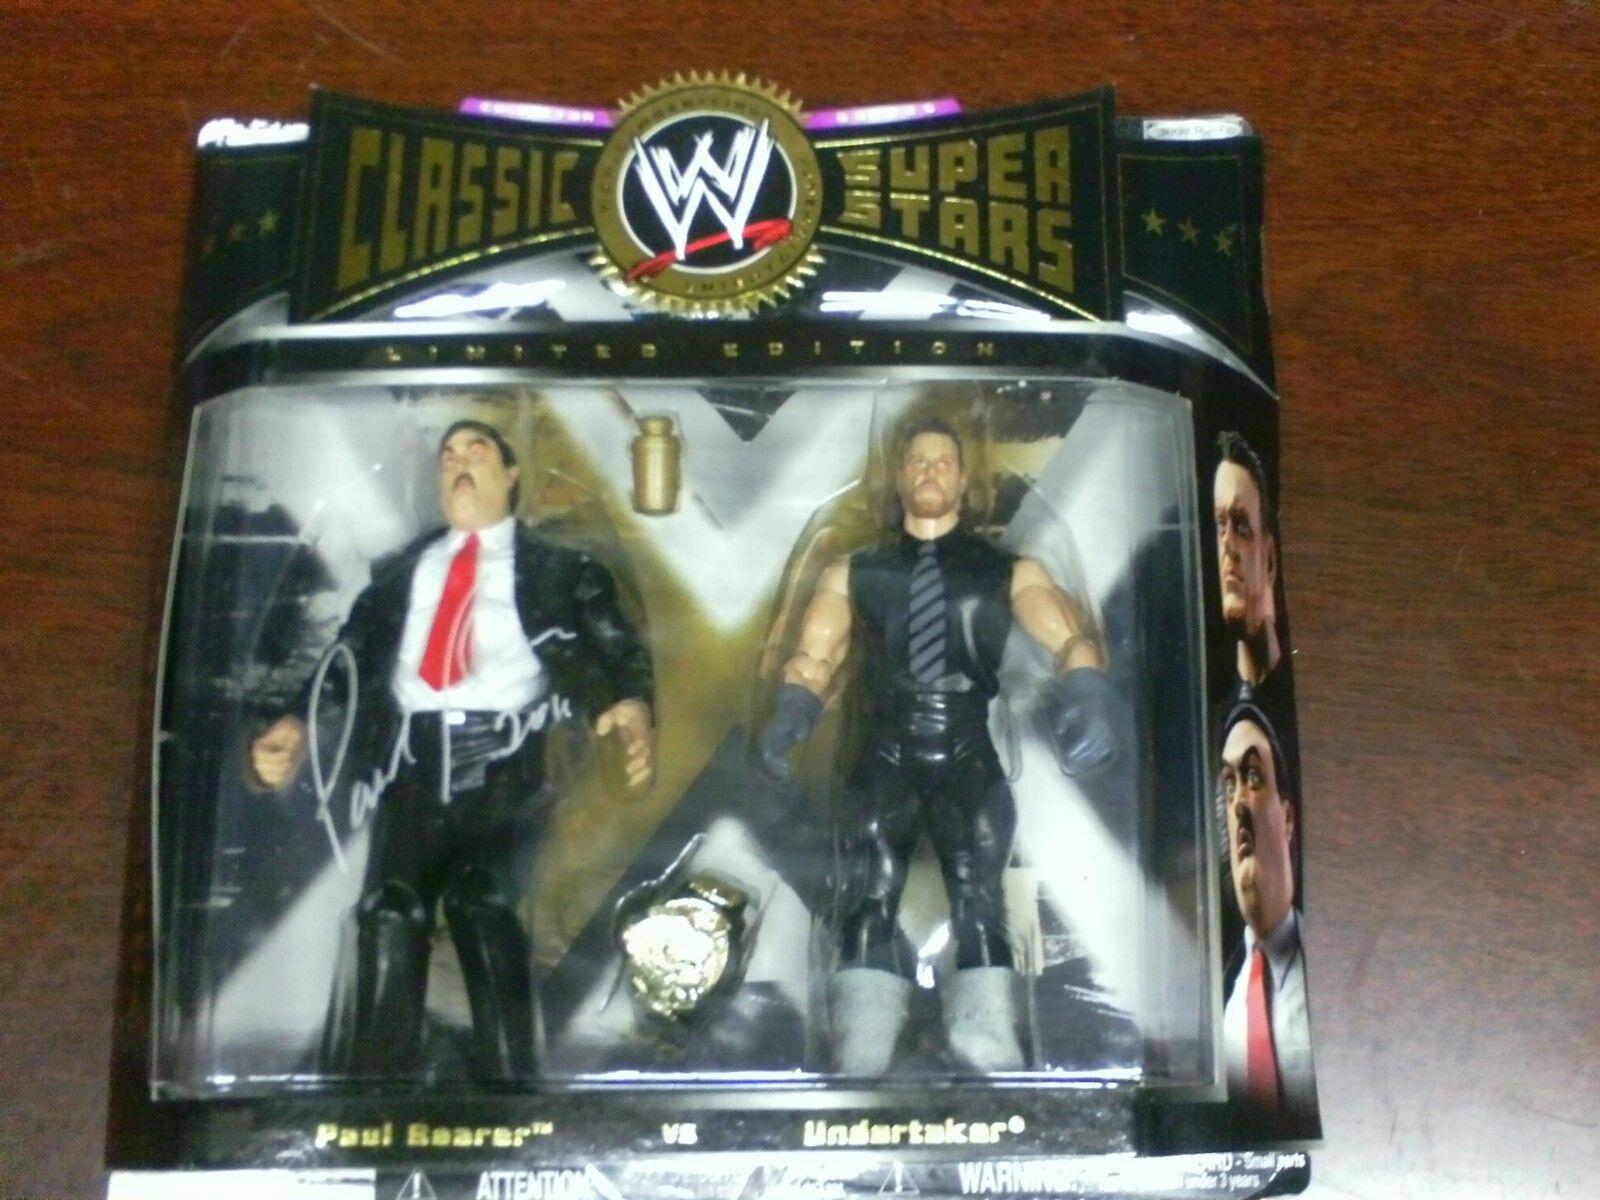 WWE CLASSIC SUPERSTARS UNDERTAKER VS PAUL BEARER AUTOGRAPH BY PAUL BEARER